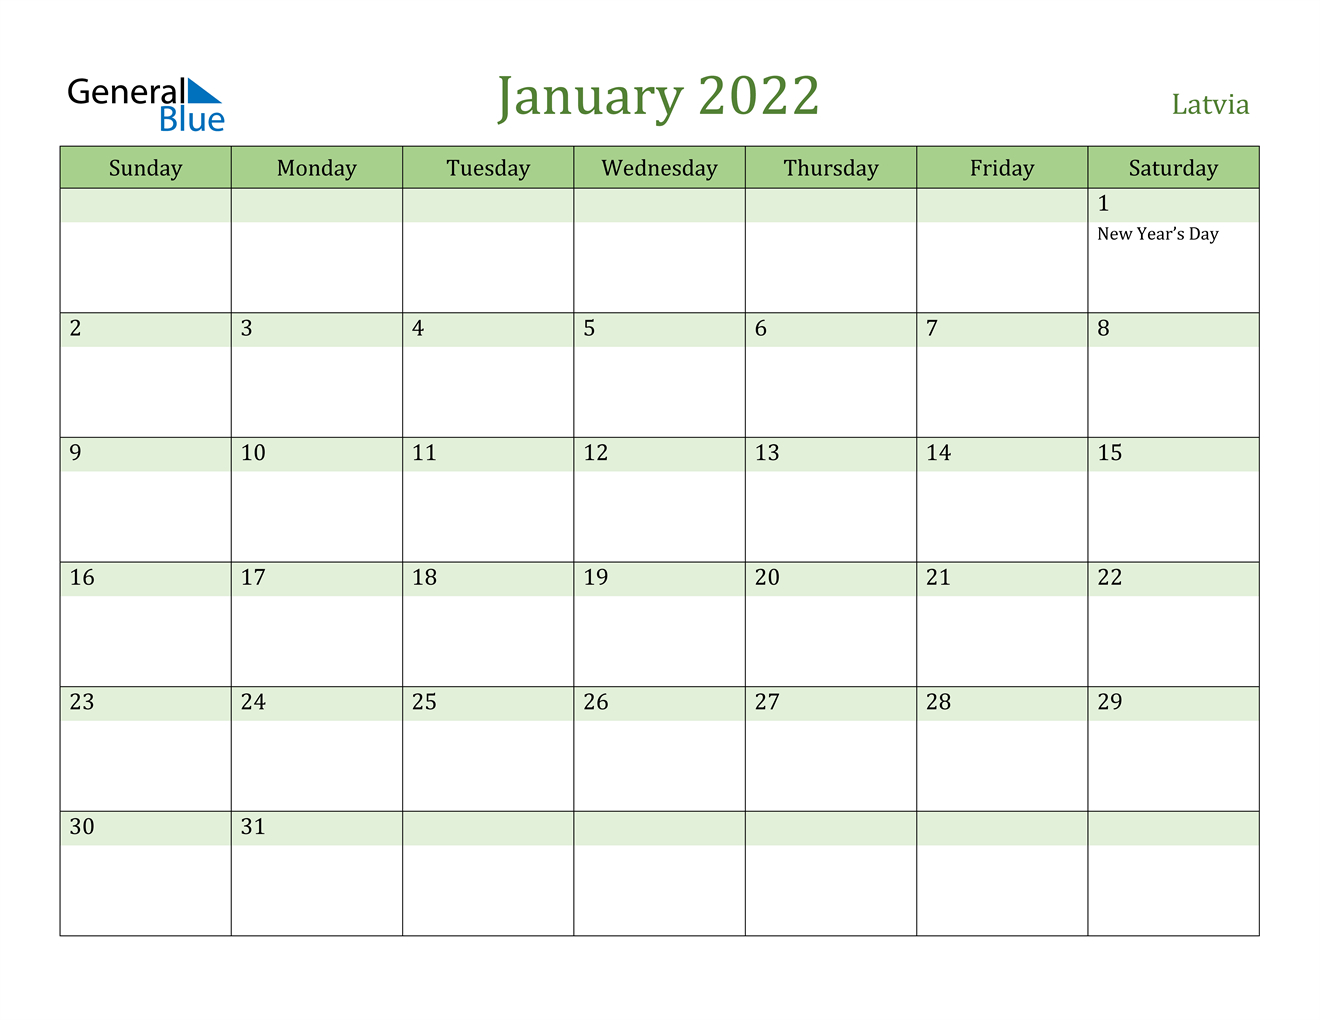 Latvia January 2022 Calendar With Holidays